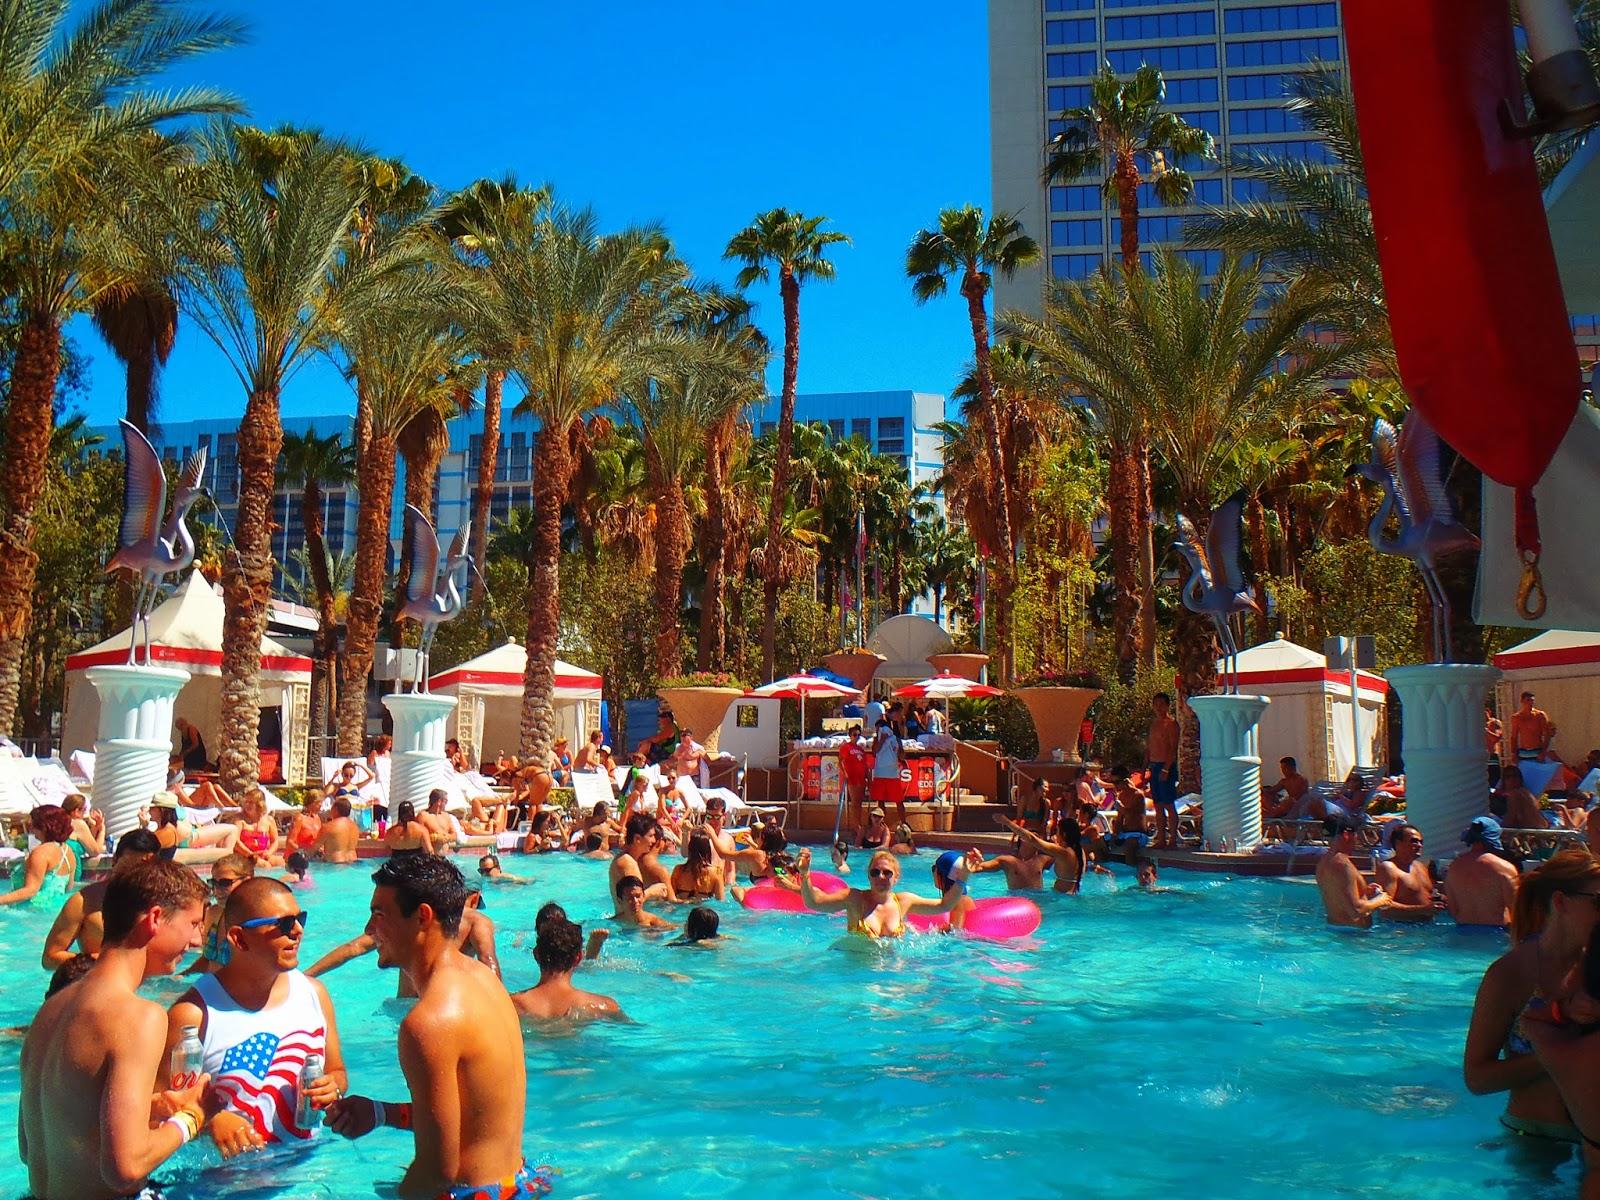 busy pool in sunny las vegas